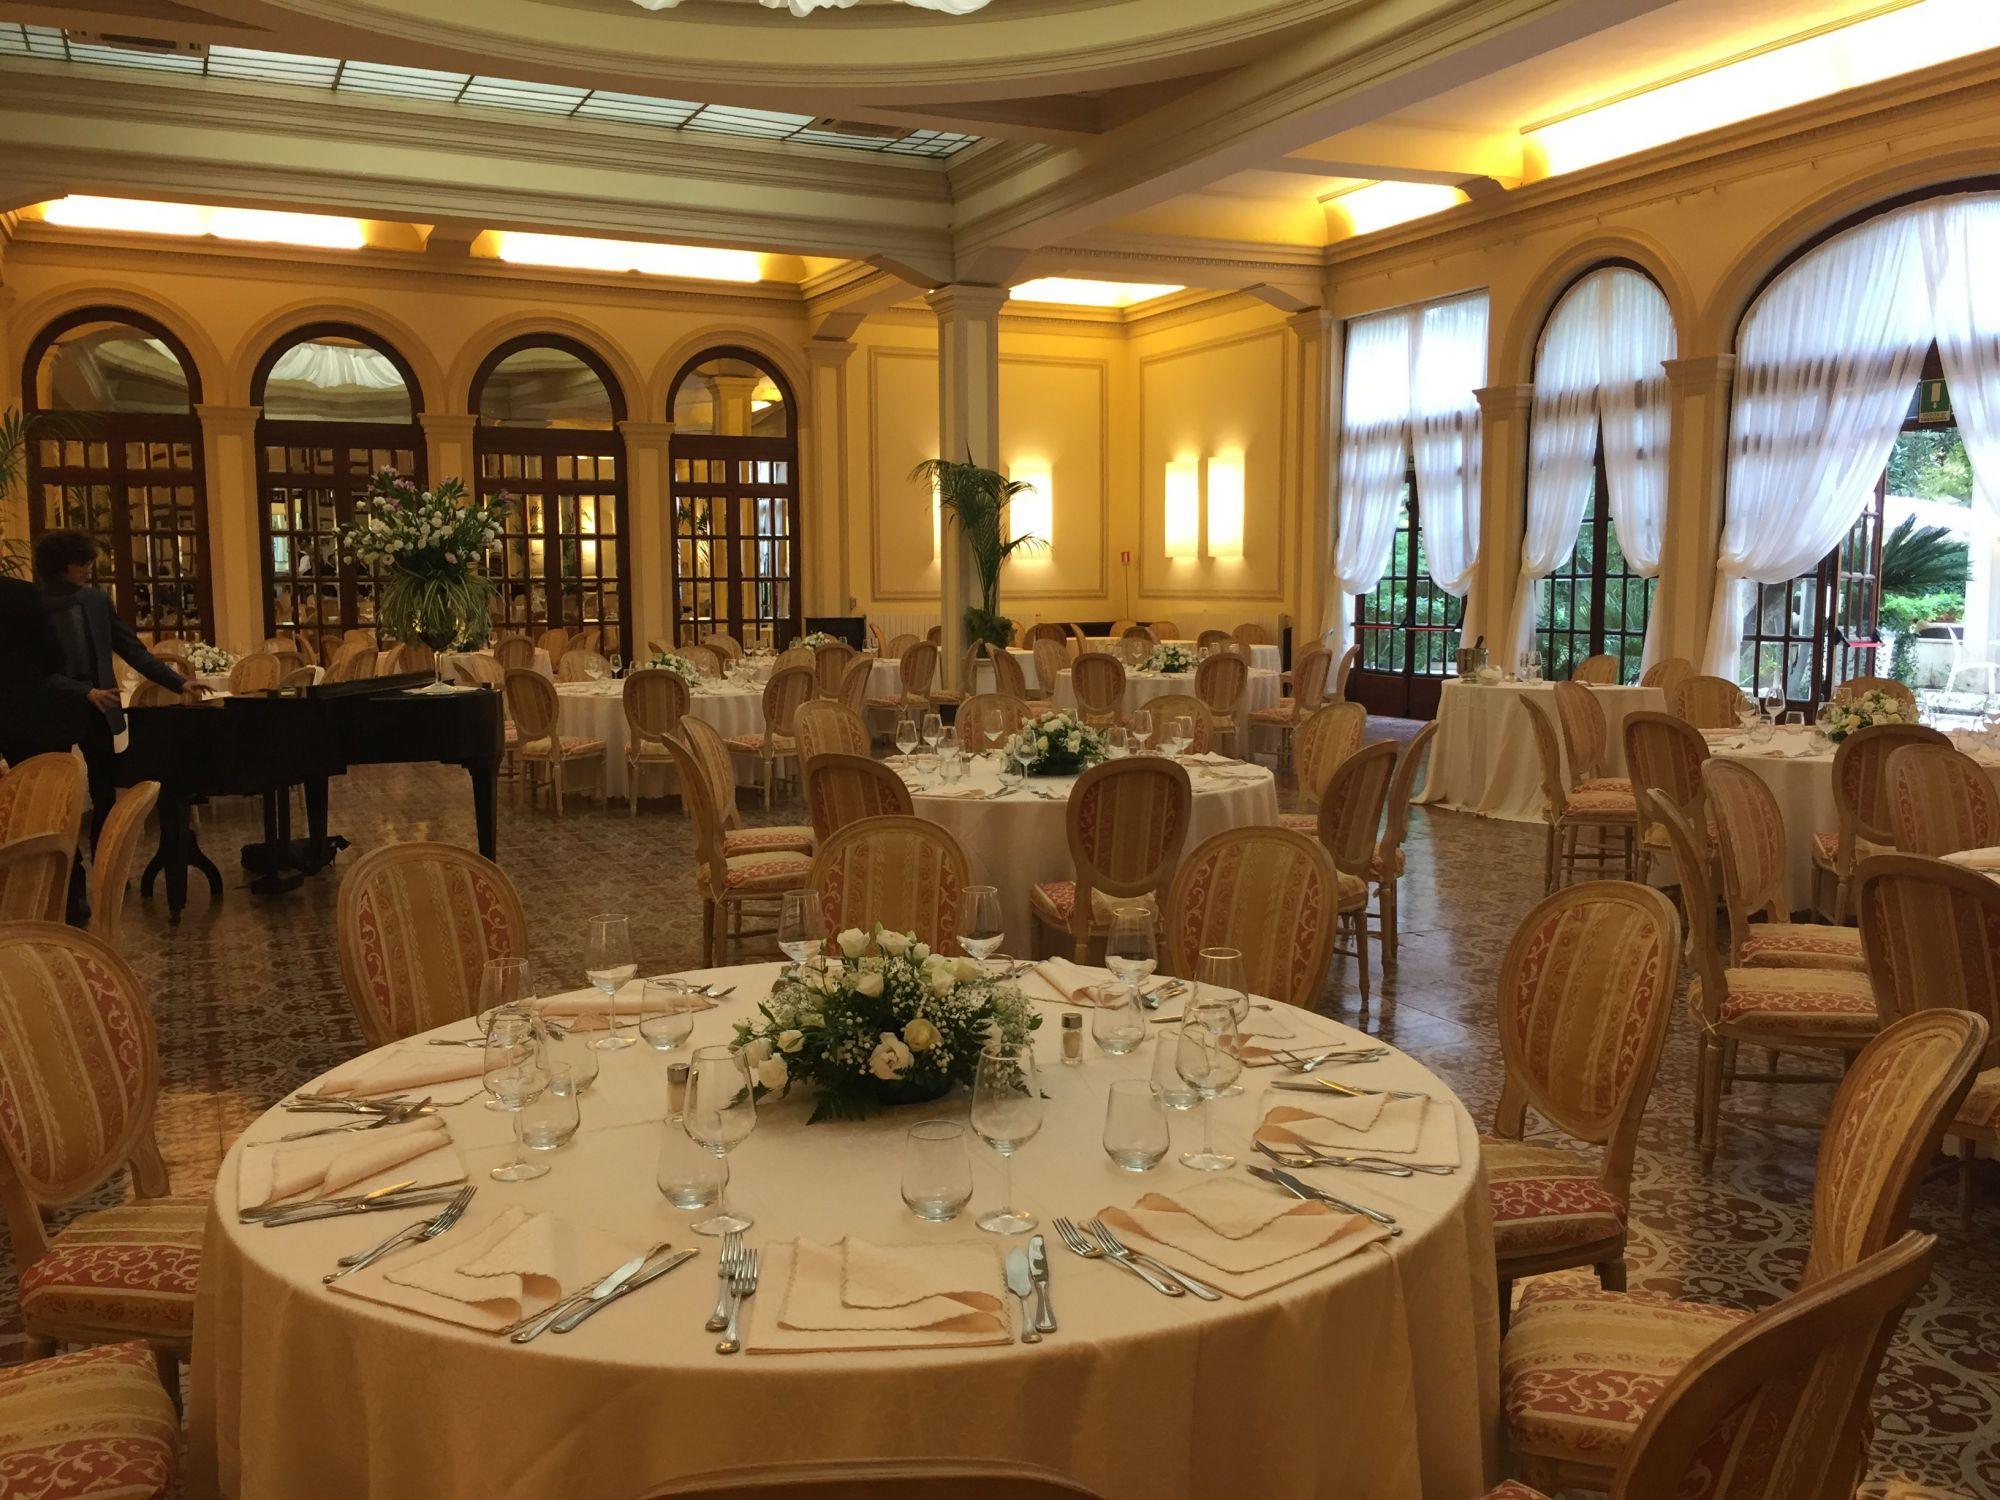 Grand Hotel Royal Viareggio 4 stelle - Versilia